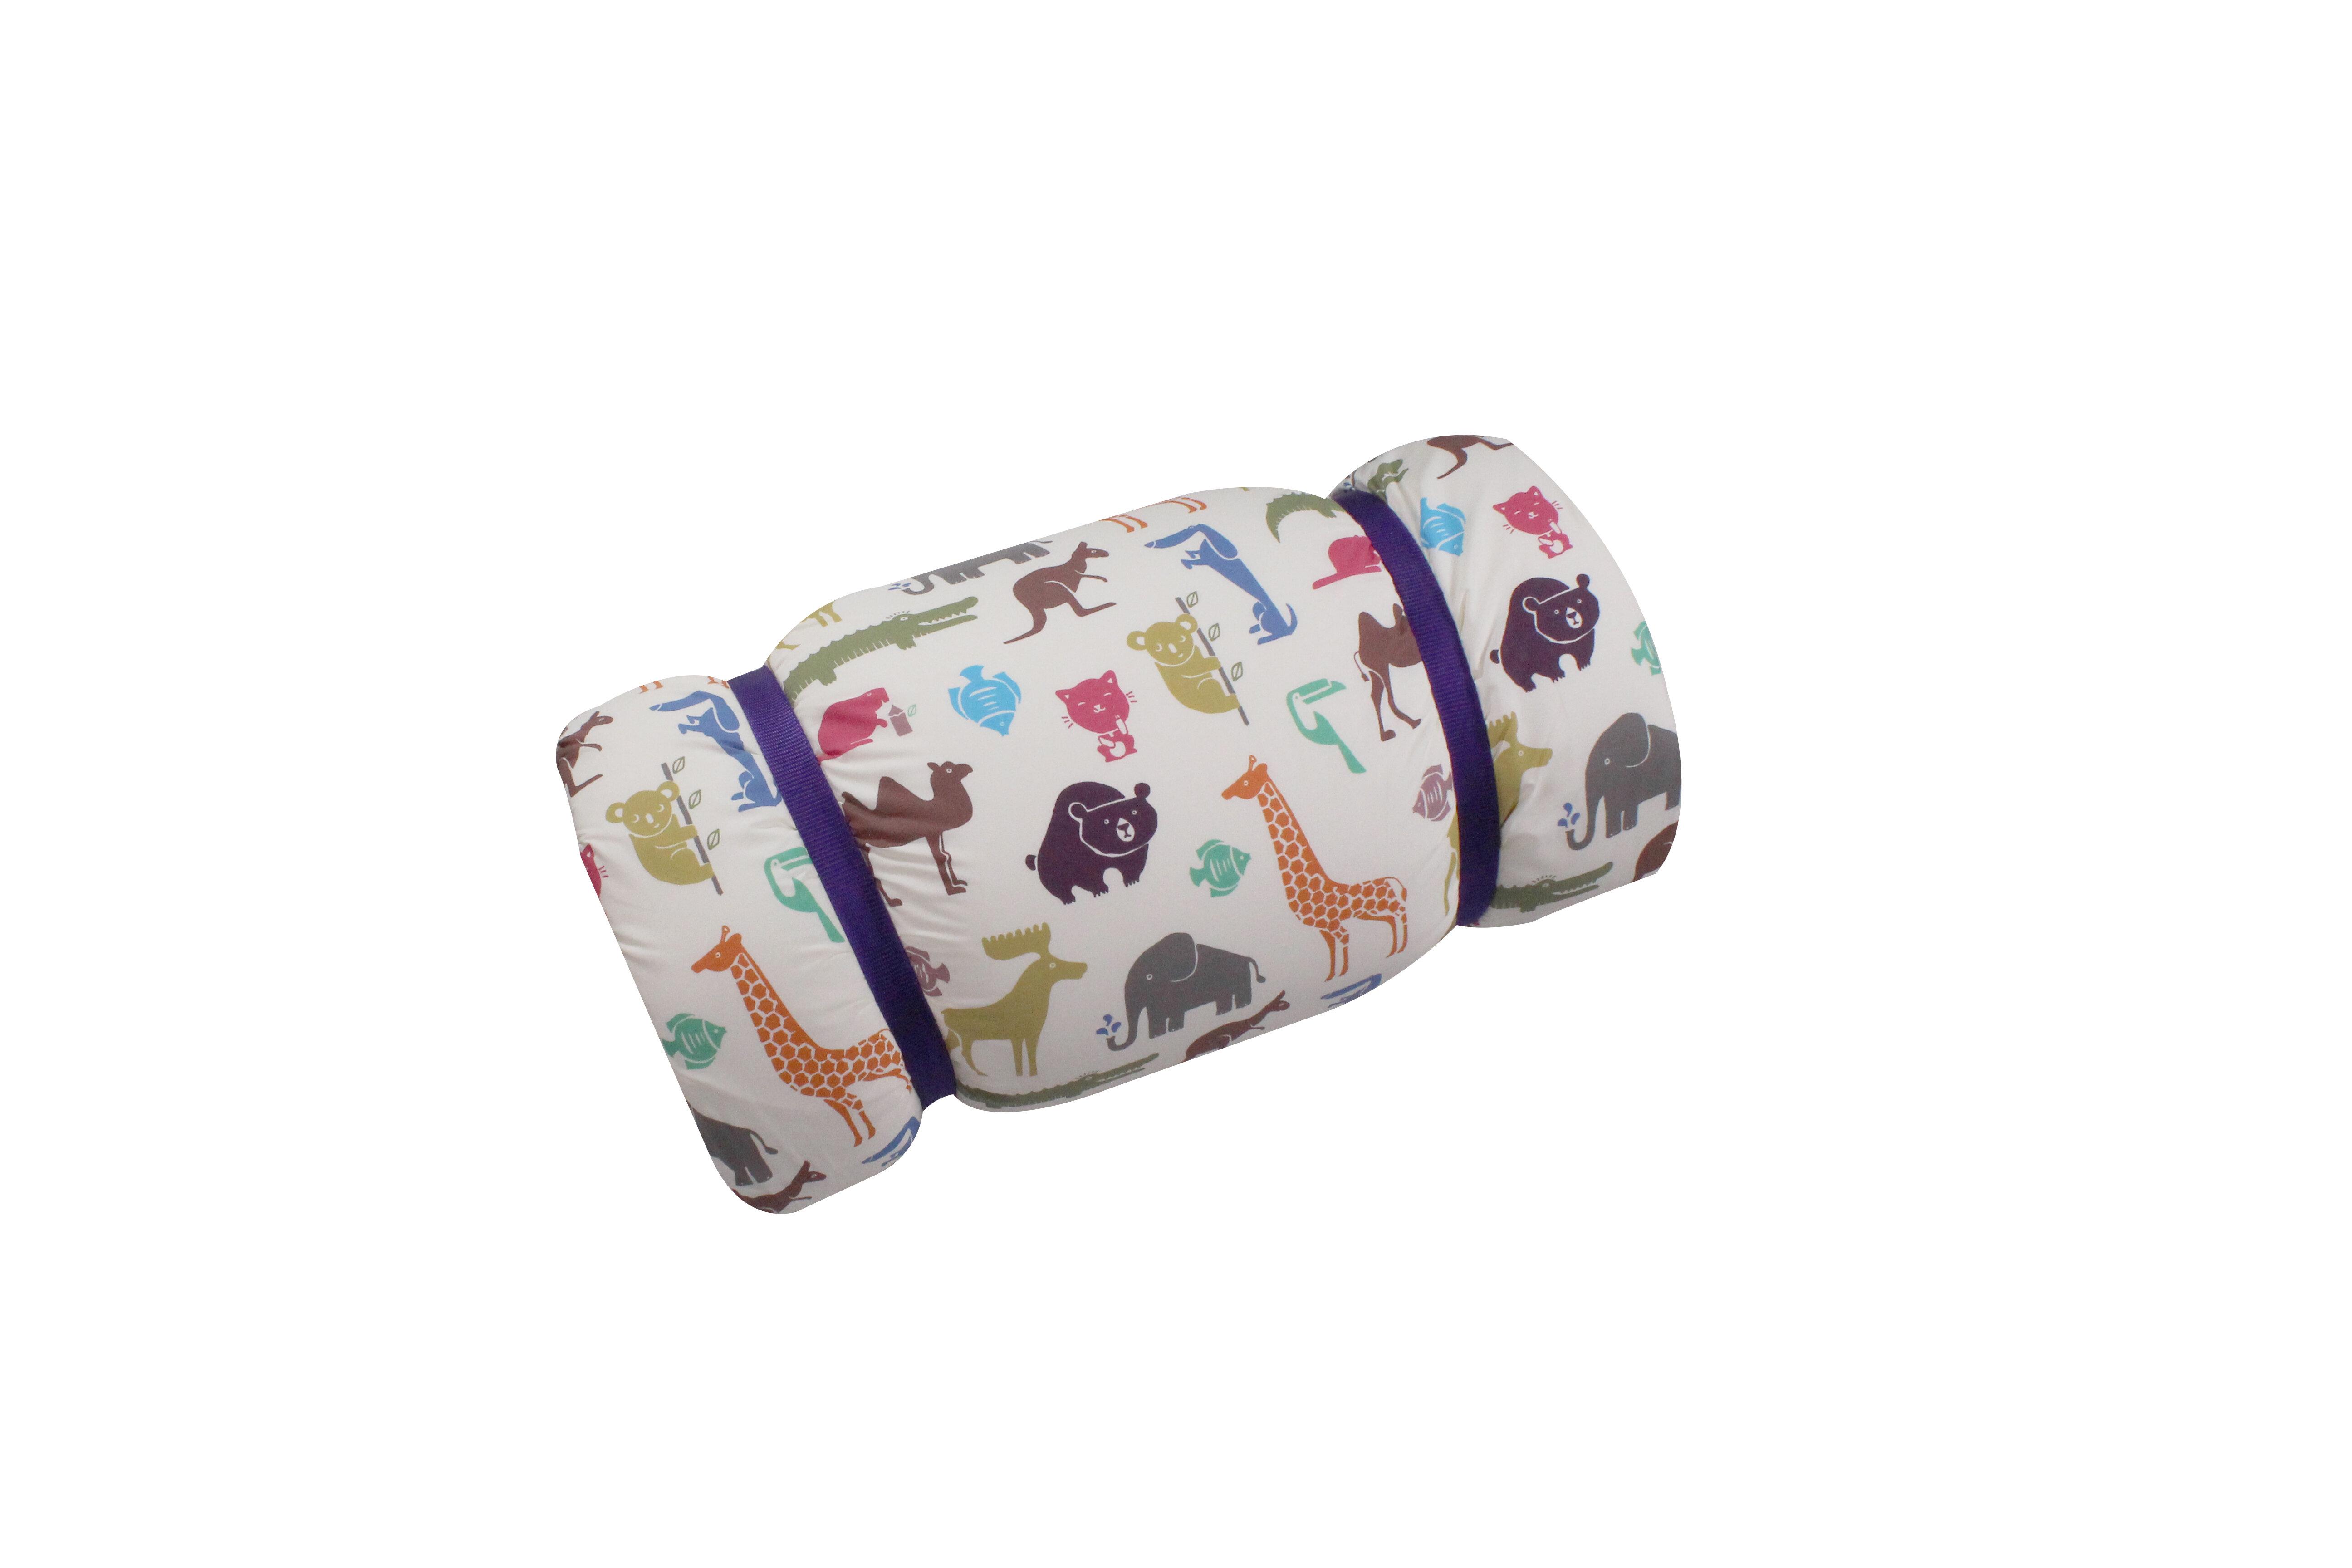 Children S Duvalay Sleeping Bag